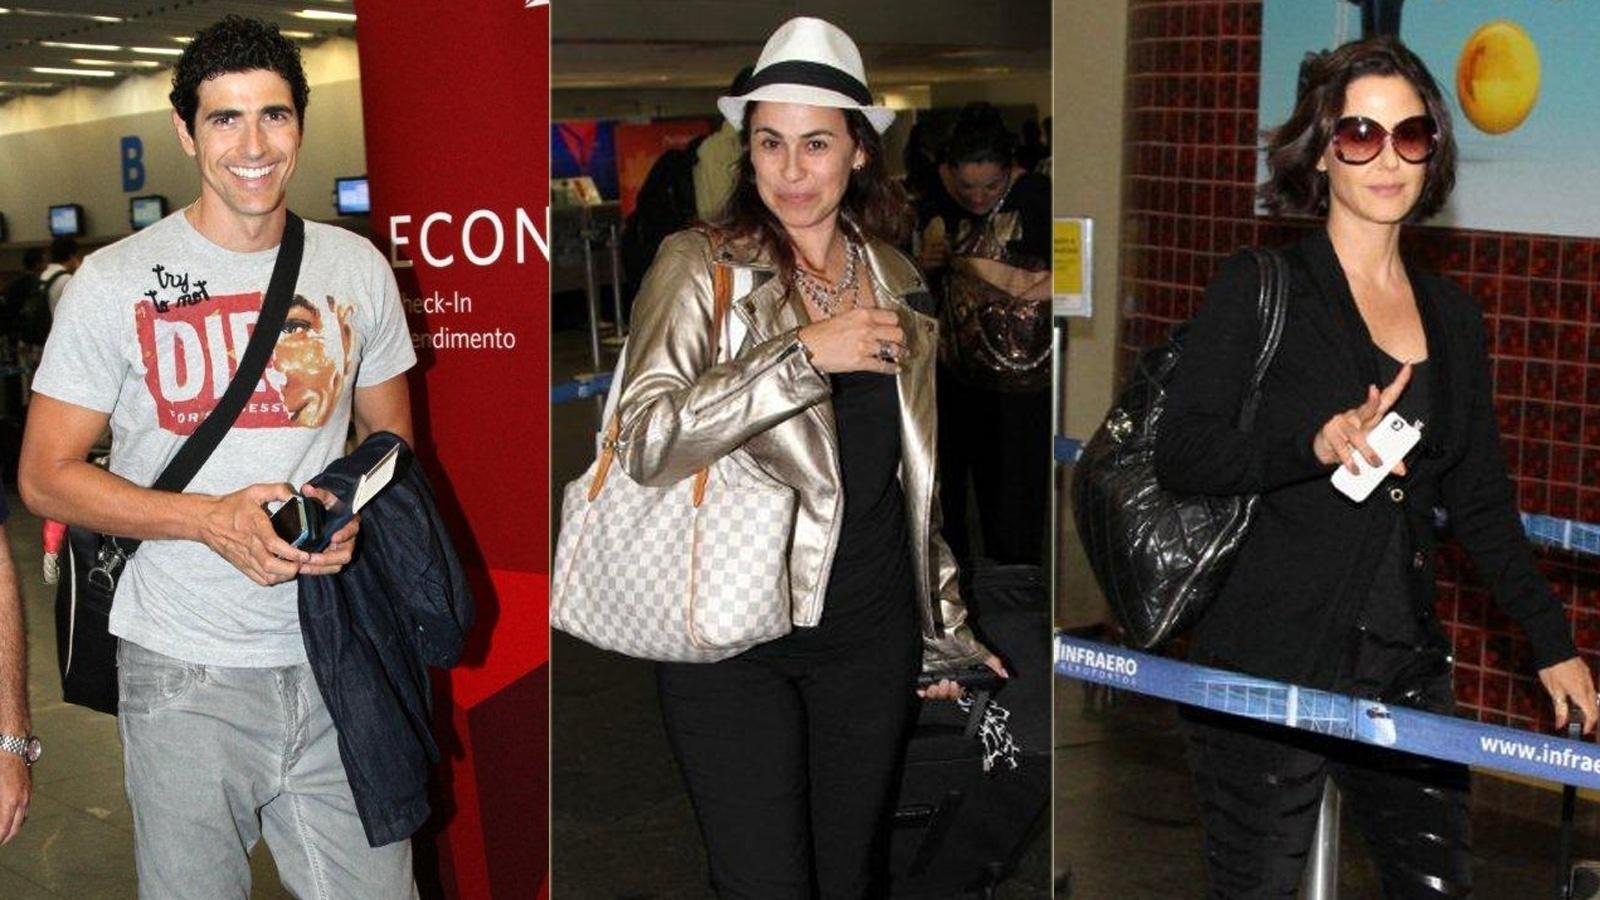 Reynaldo Gianecchini, Guilhermina Guinle e Daniela Escobar embarcam rumo aos Estados Unidos no aeroporto Antônio Carlos Jobim, no Rio de Janeiro (12/9/12)